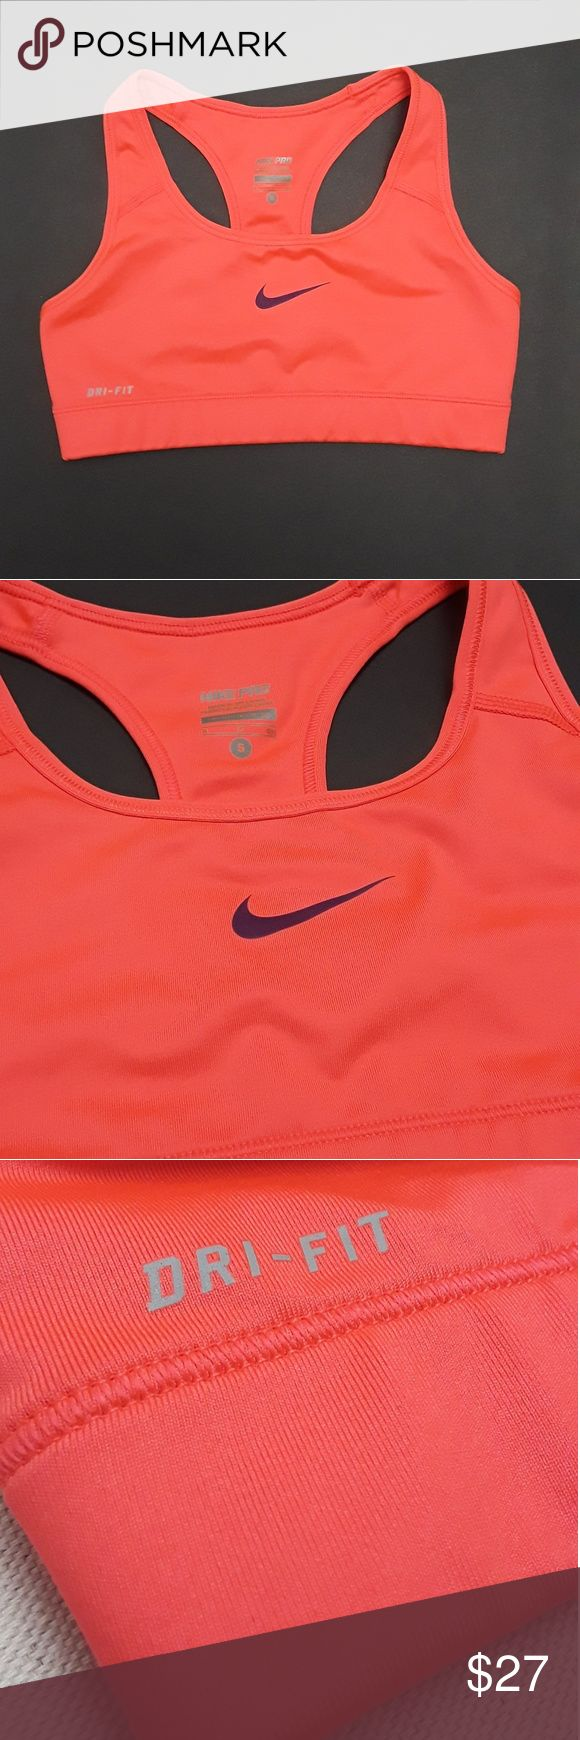 Nike Pro Dry Fit Neon Orange Sport Bra Size Small Orange